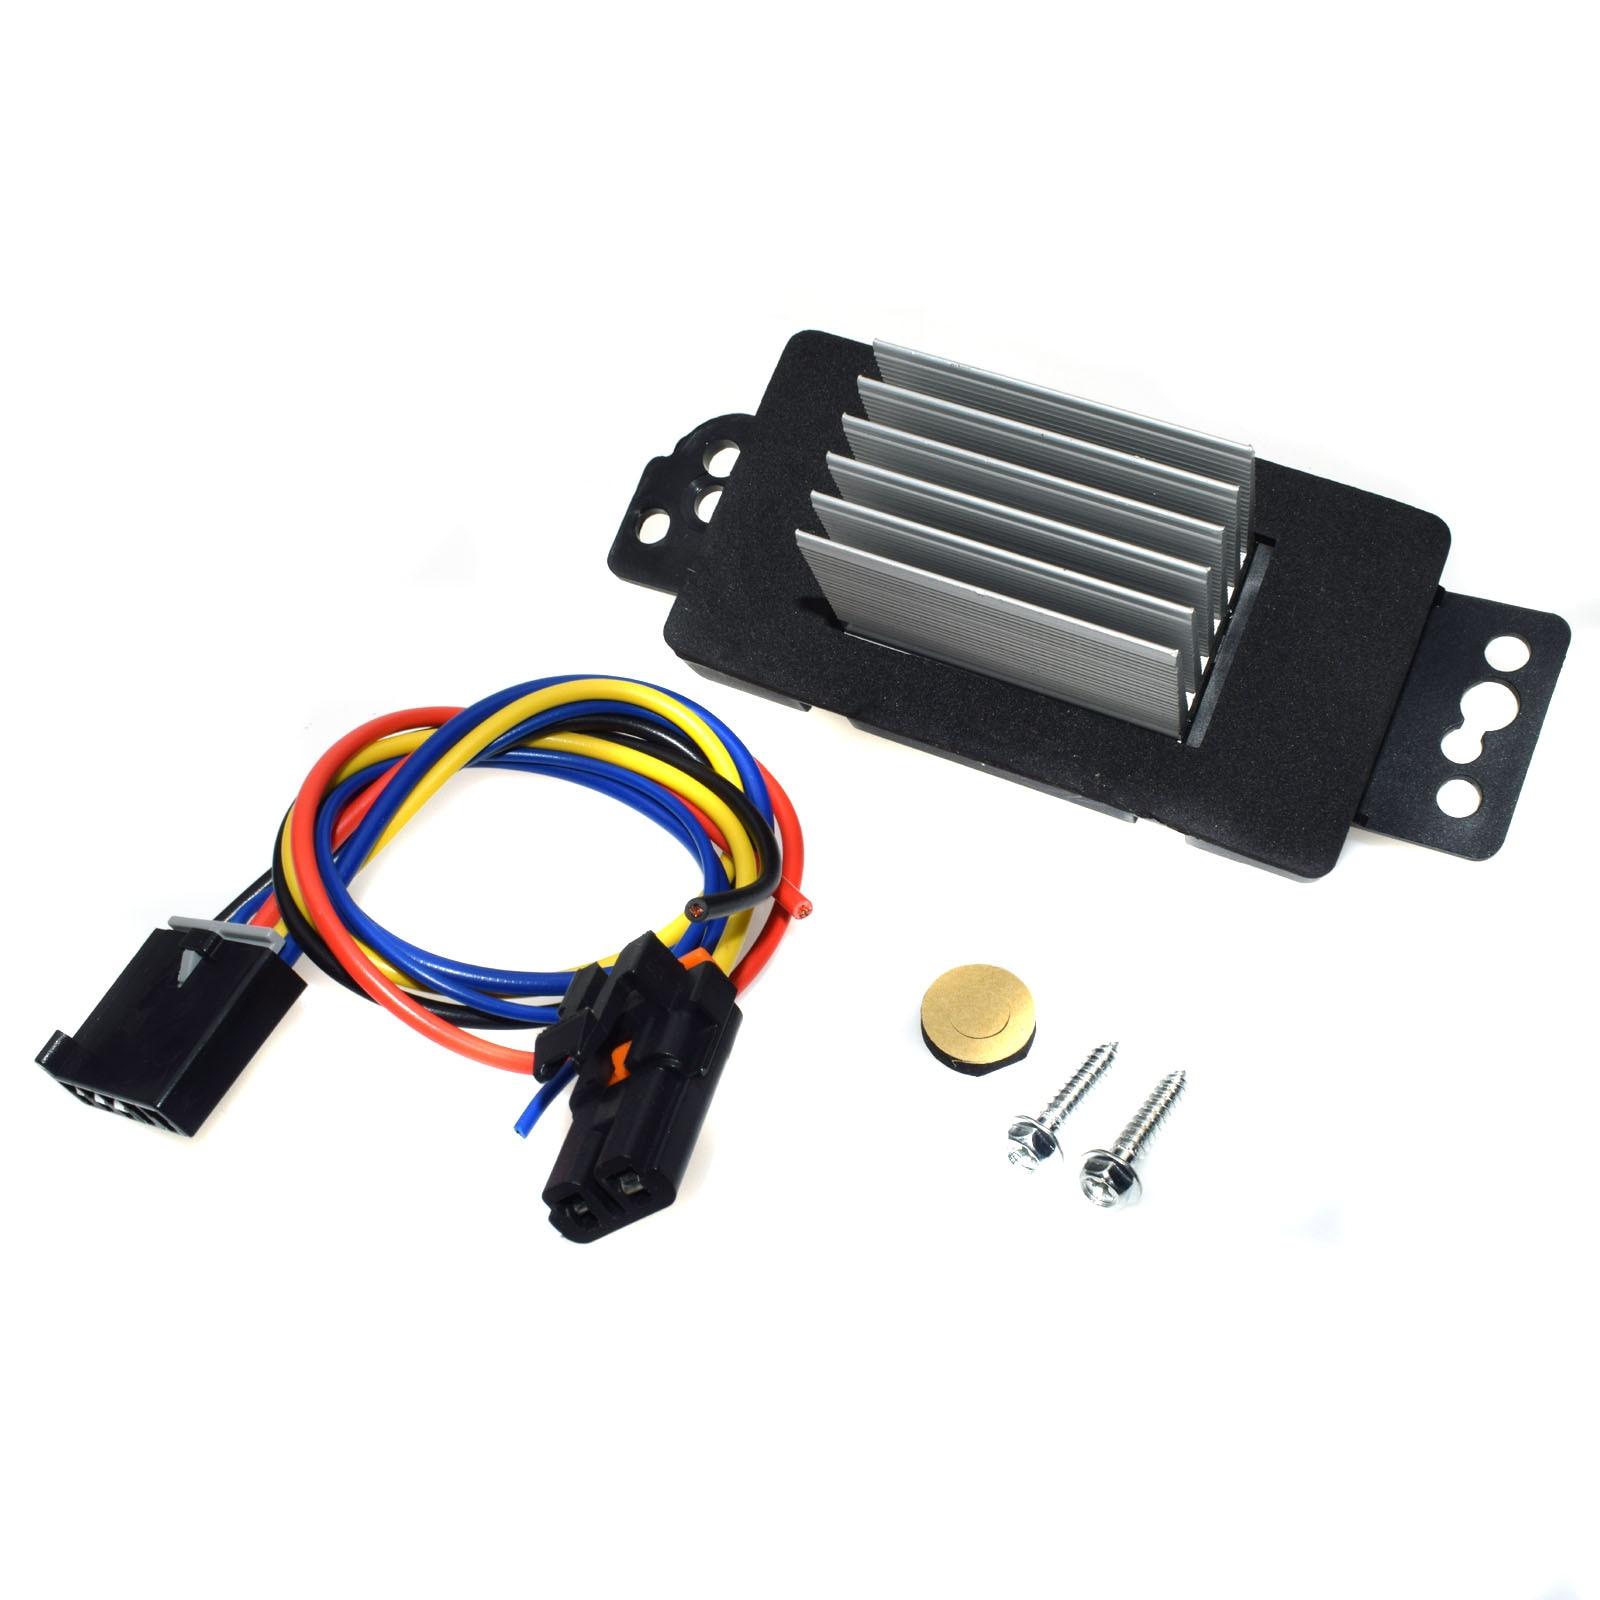 wolfigo new hvac blower motor resistor with plug harness 15850268 22754990 ru359 1580888 for pontiac chevrolet impala buick in blower motors from  [ 1600 x 1600 Pixel ]